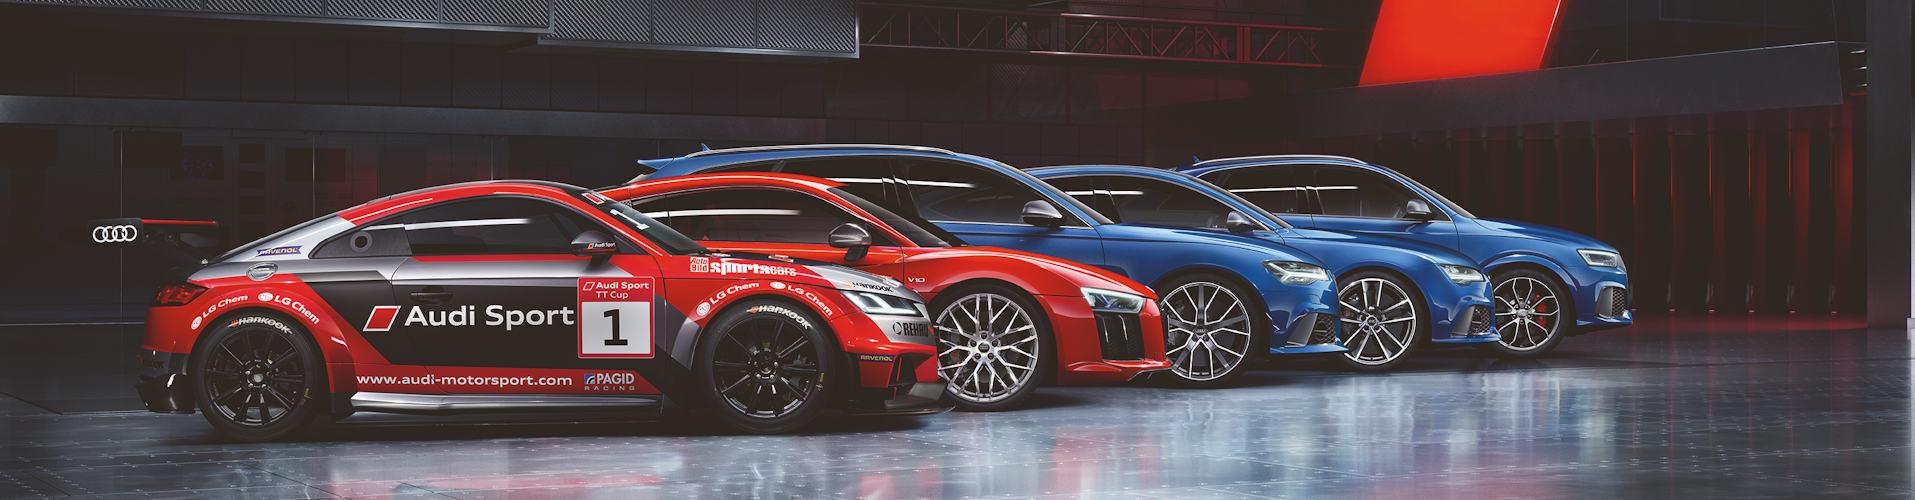 VW Group Careers - Audi car job vacancy